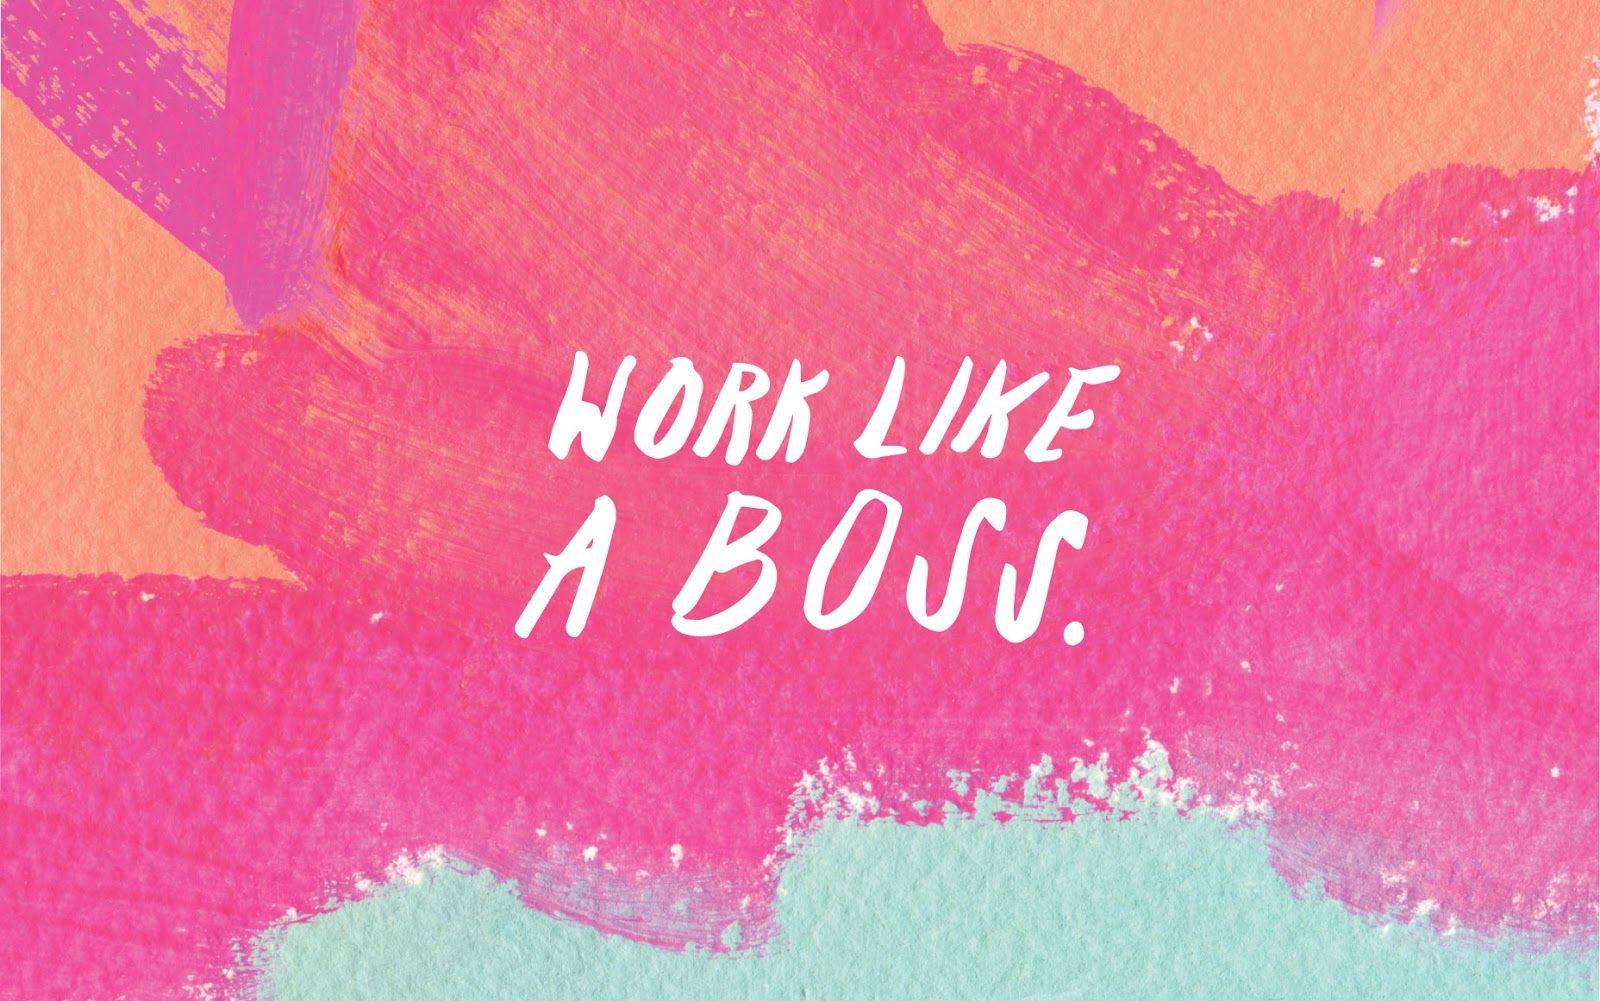 Beautiful Motivational Desktop Wallpapers Cute Tumblr Wallpaper Boss Wallpaper Laptop Wallpaper